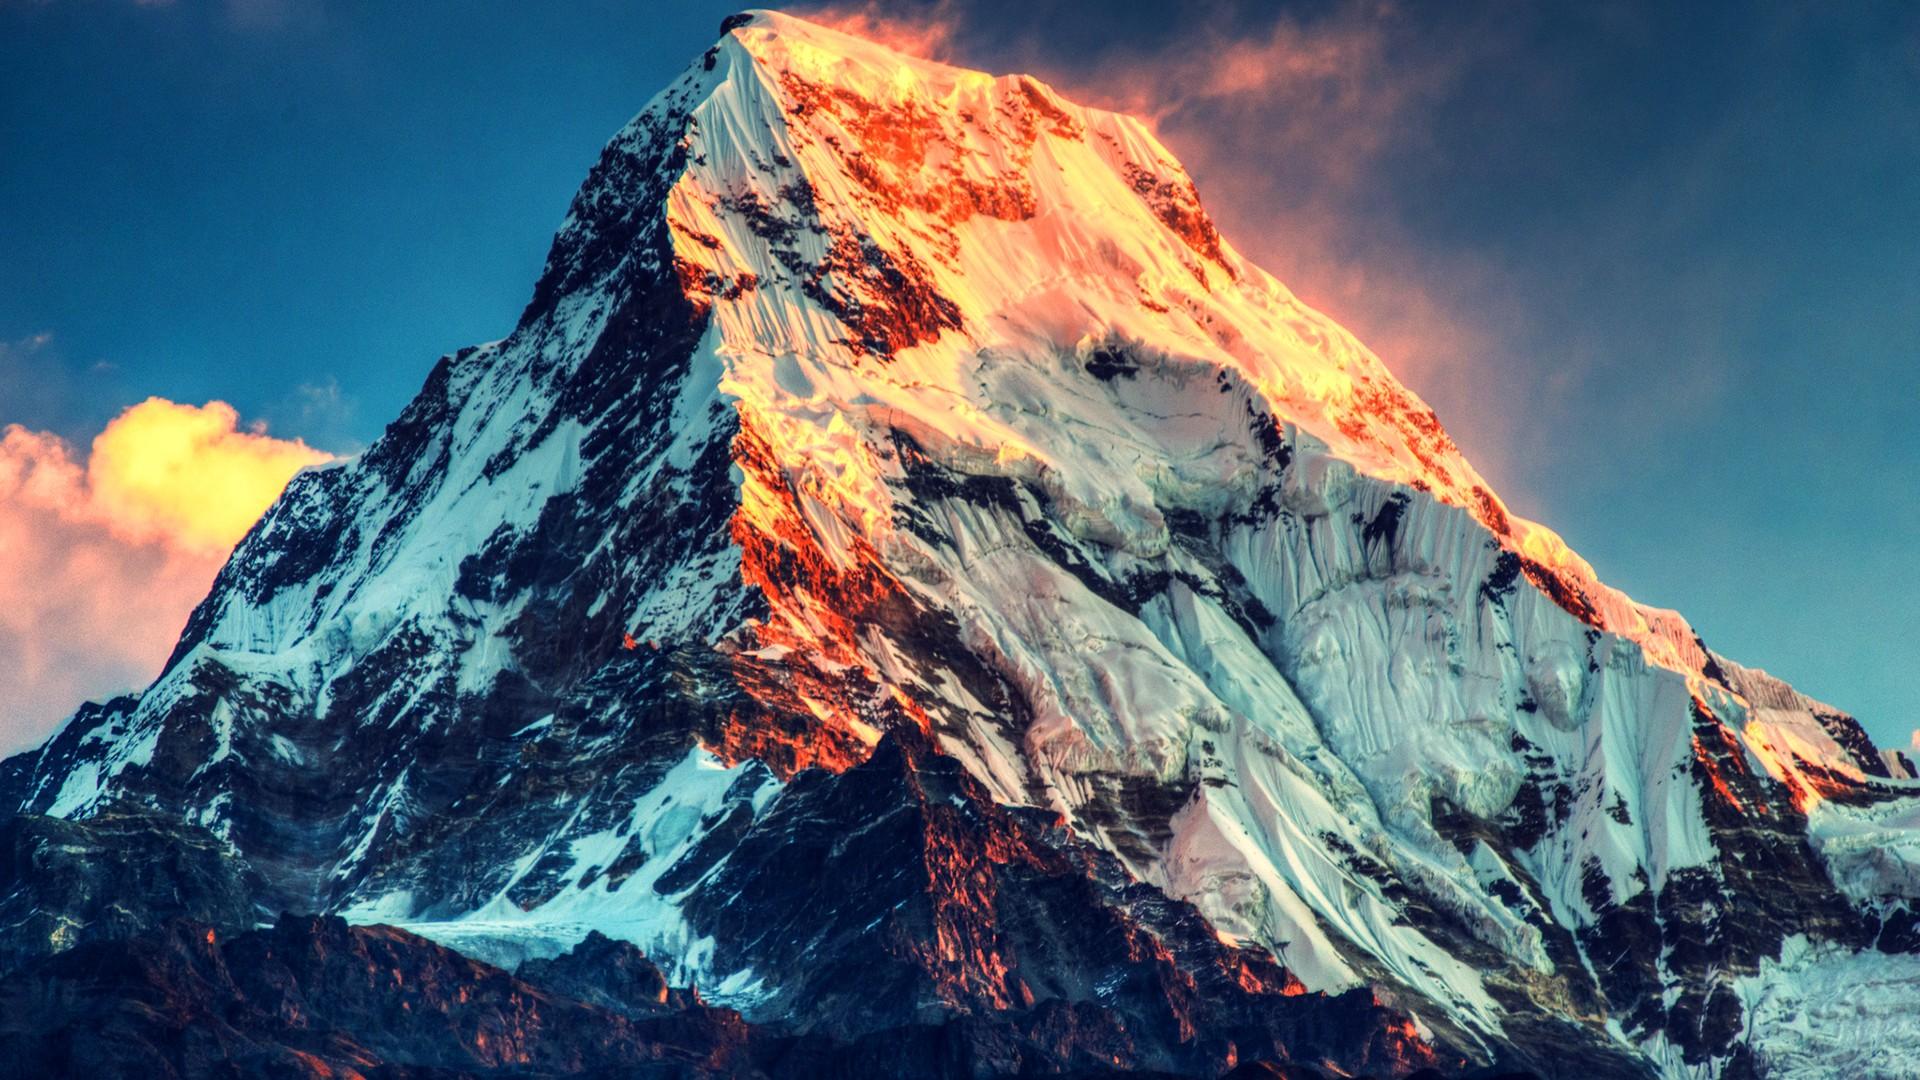 General 1920x1080 nature mountains Mount Everest landscape winter snow China sunset snowy peak Himalayas windy clouds sunlight annapurna